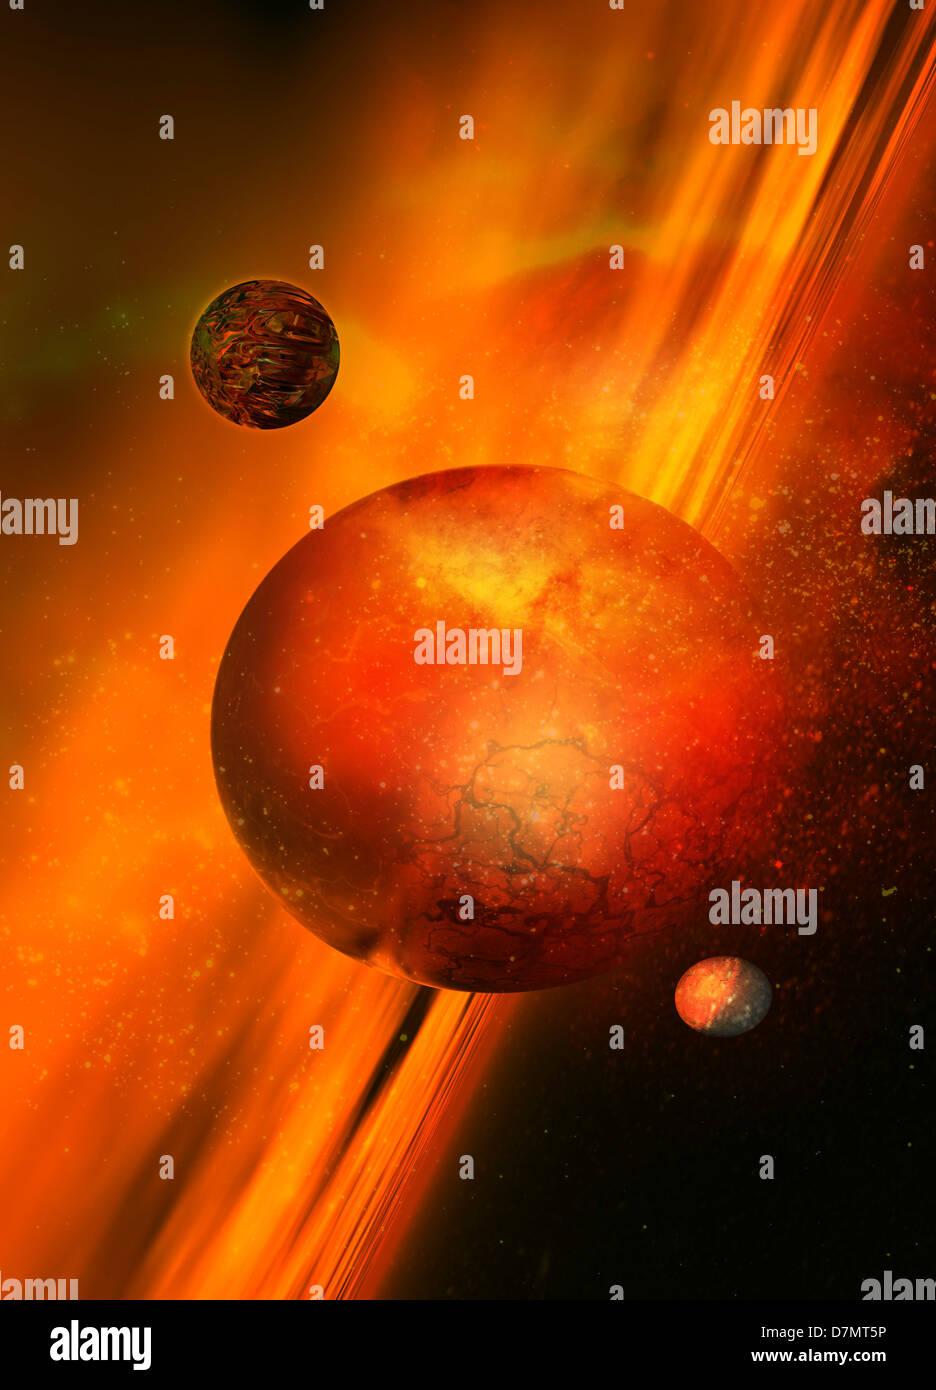 Planetary formation, artwork - Stock Image